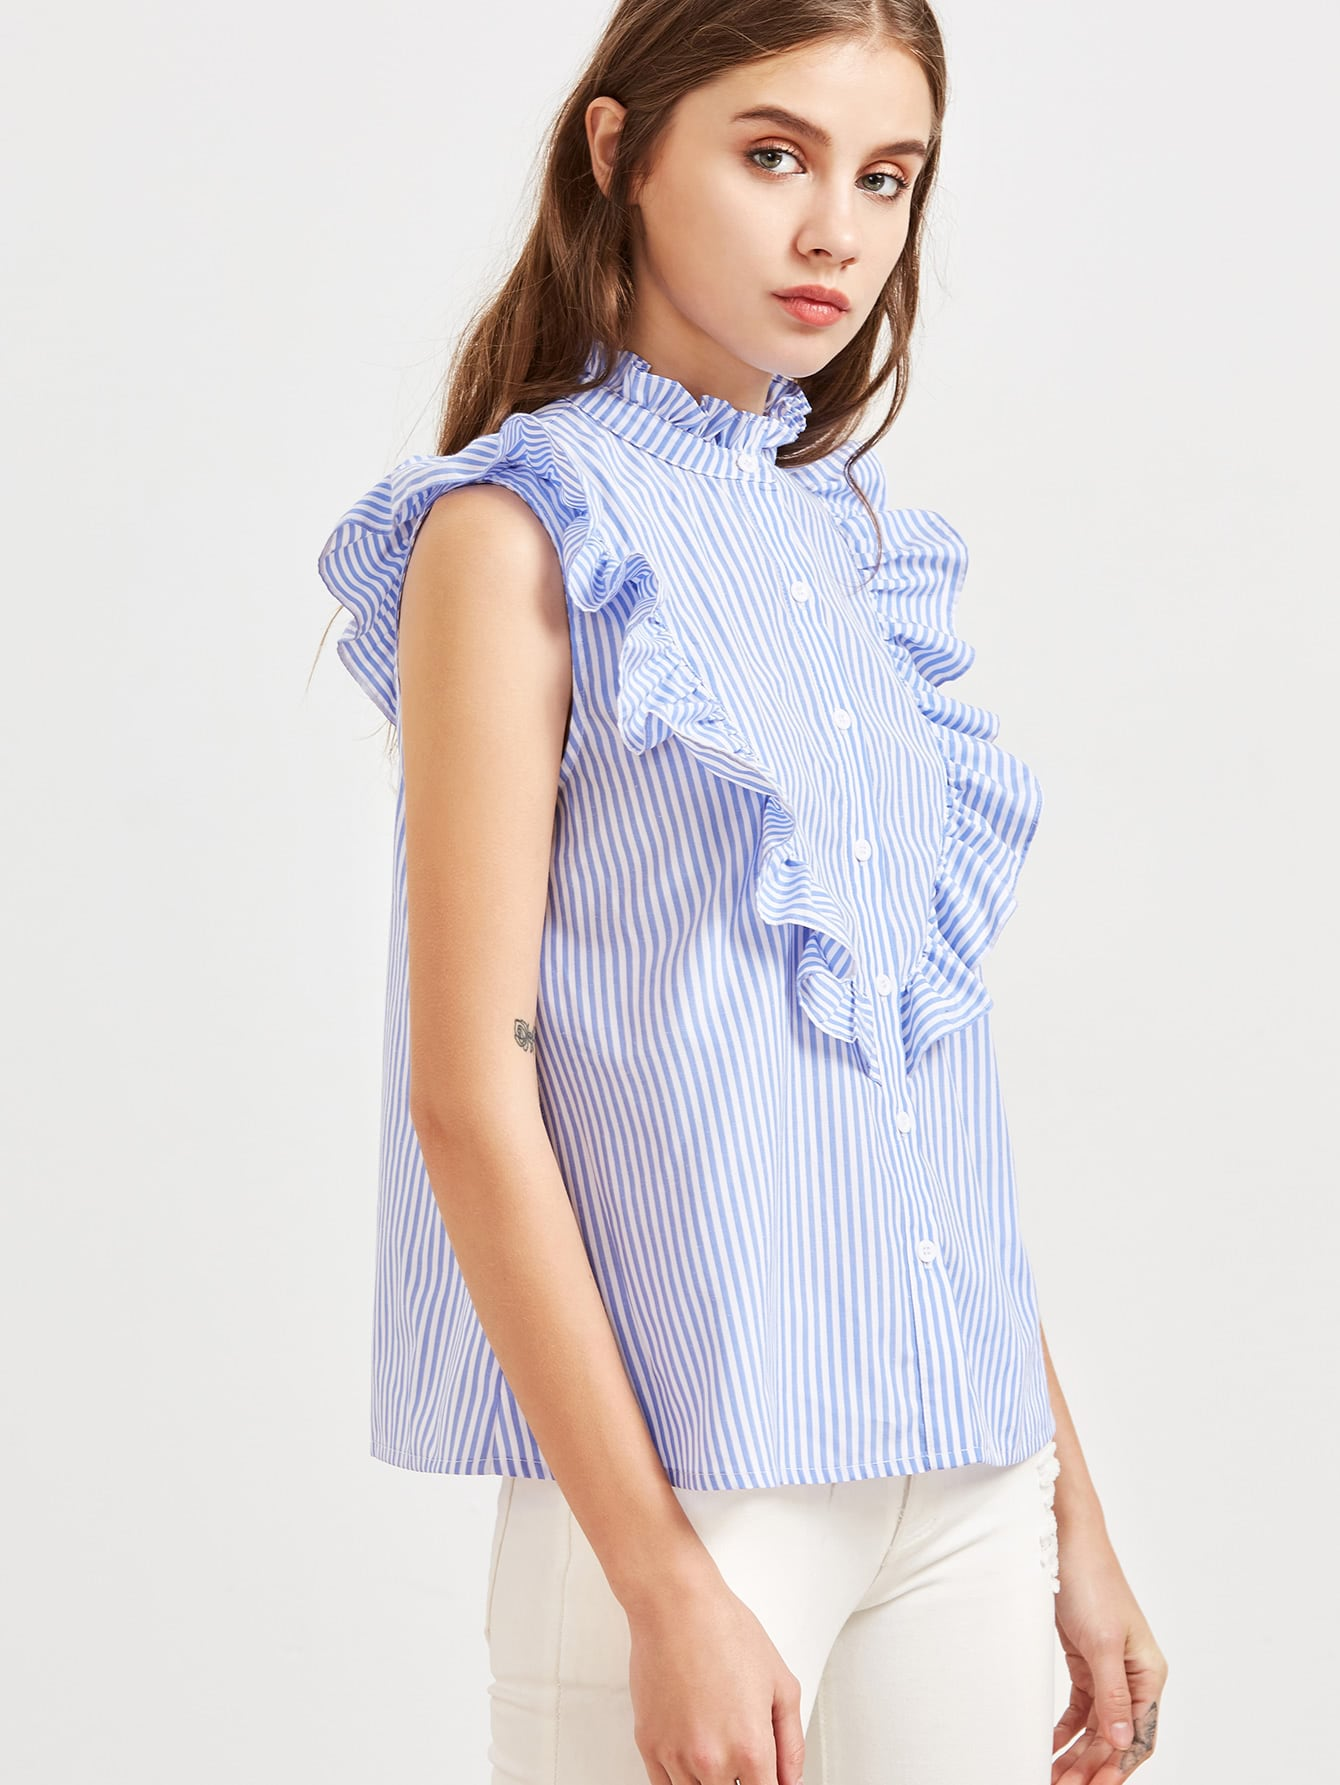 blouse170213712_2